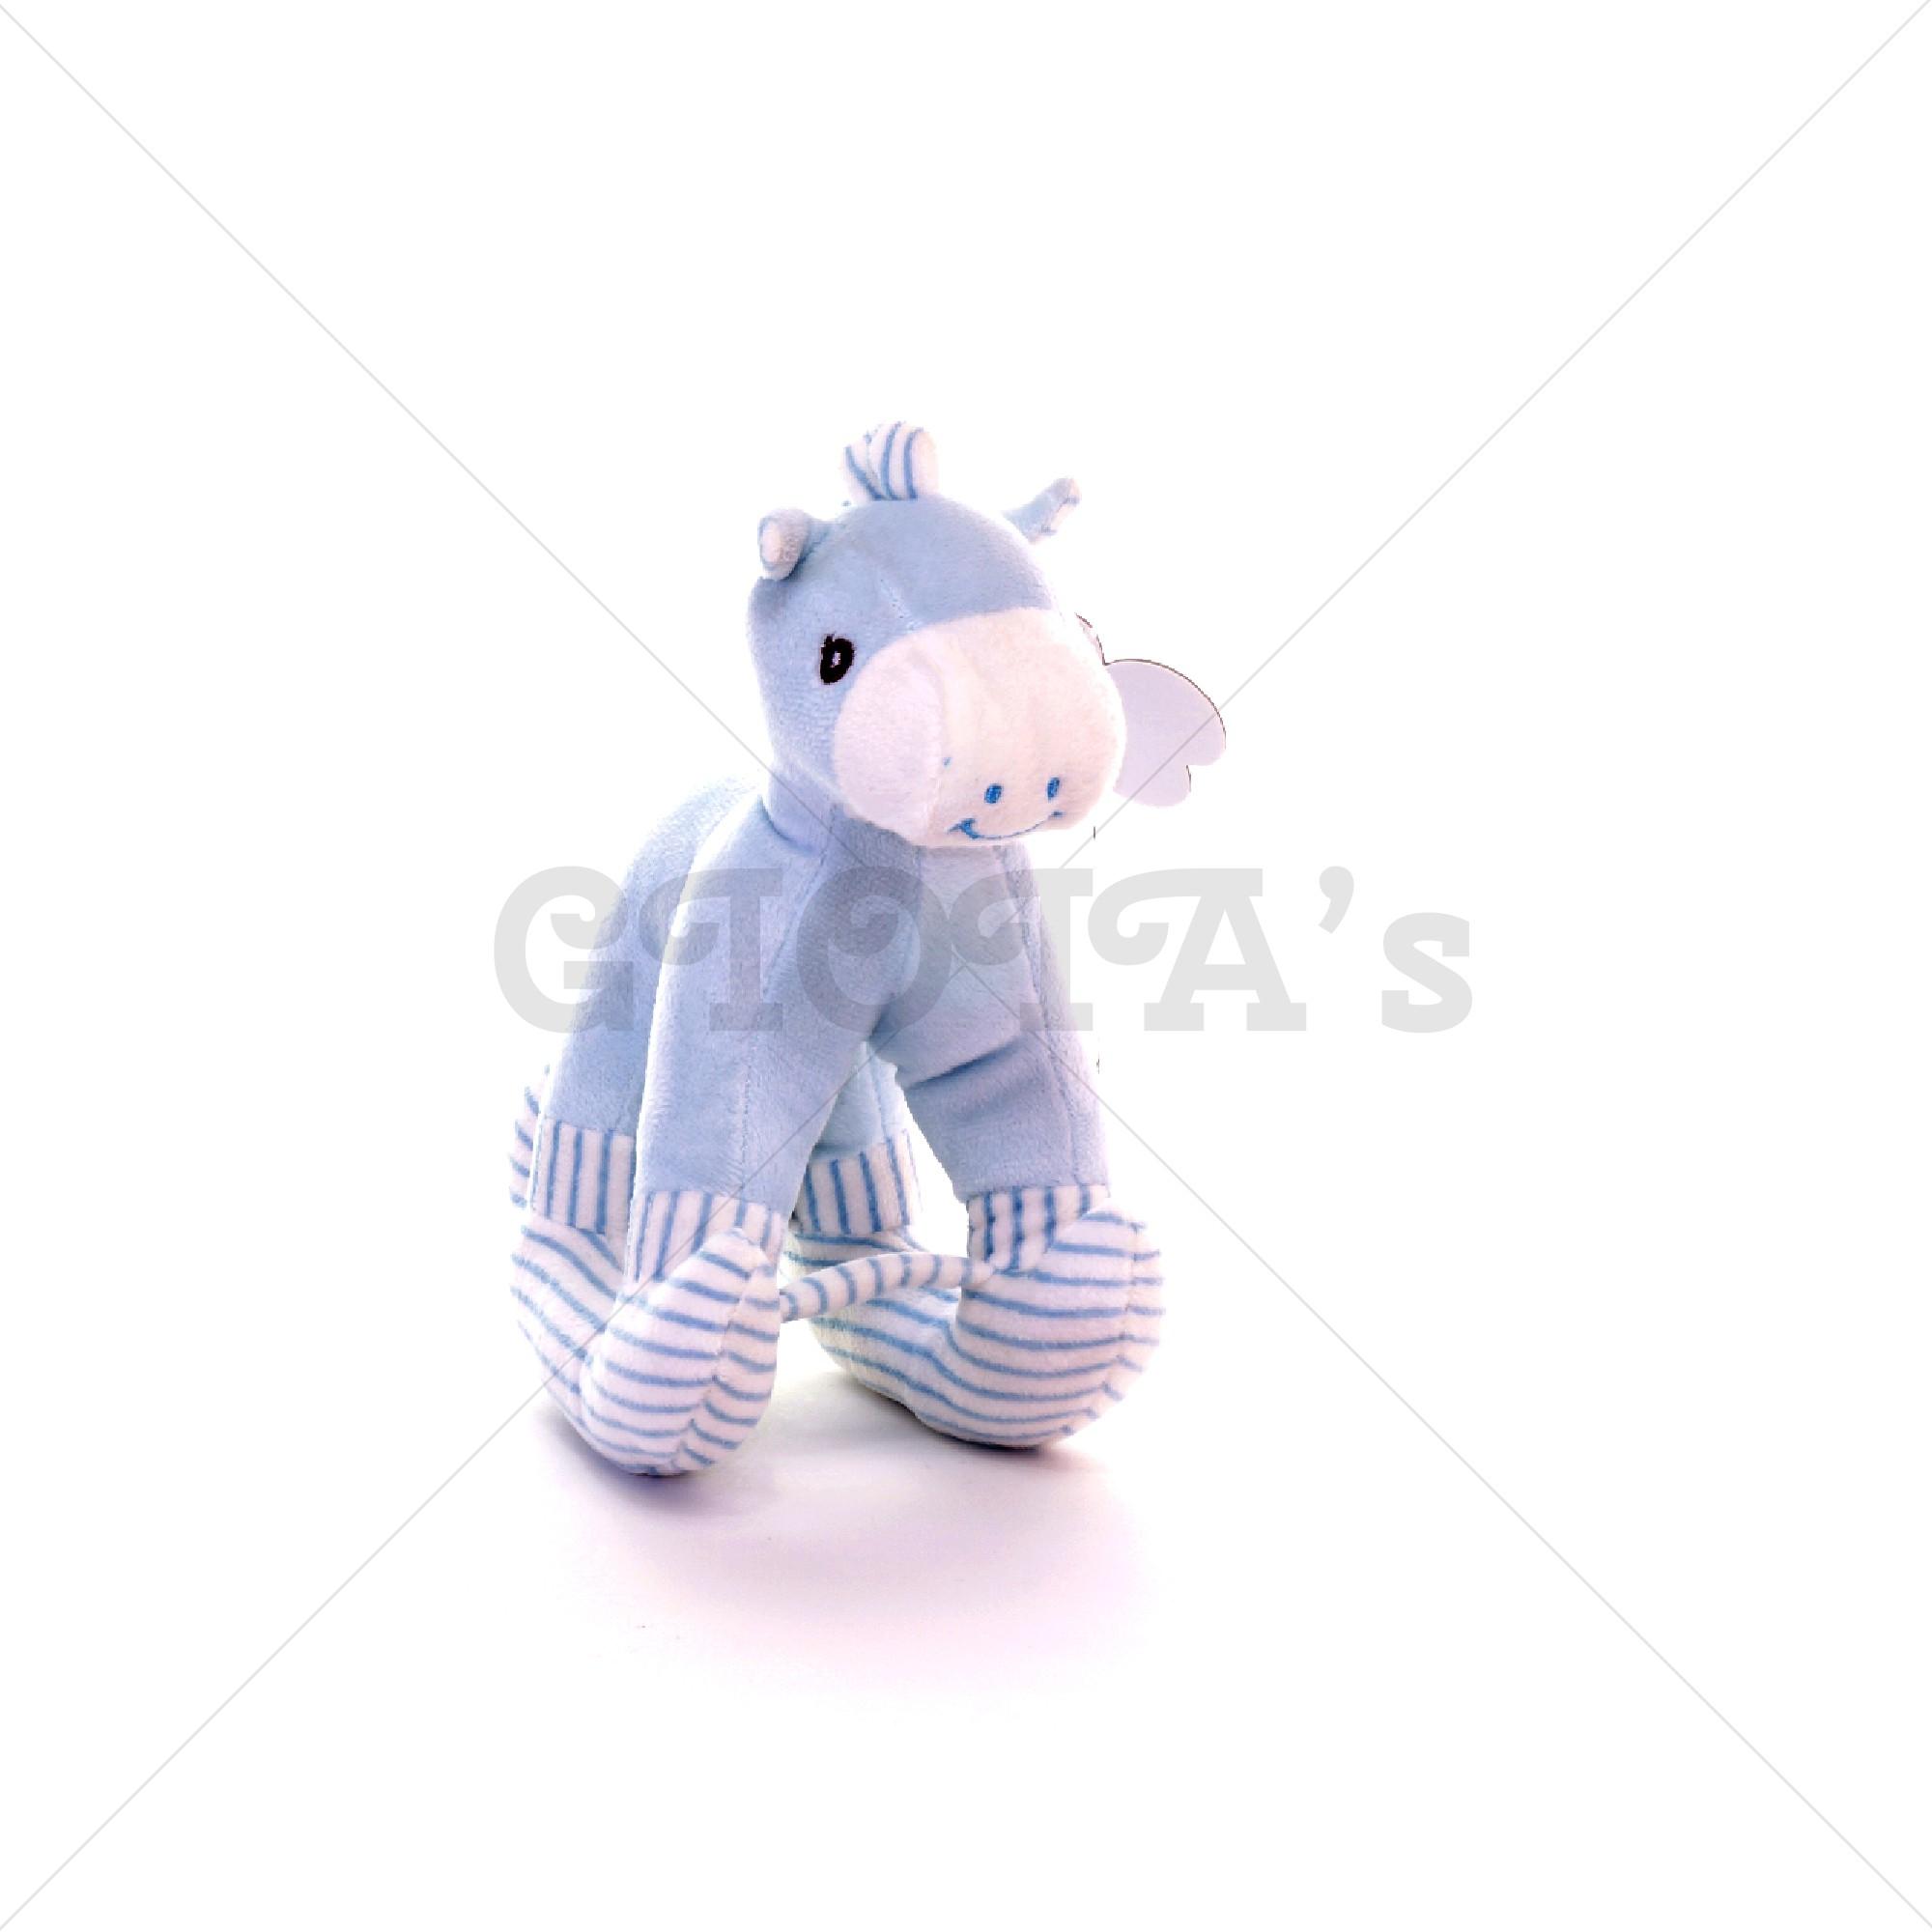 344e6087f382f9 Pluche hobbelpaard 20 cm - blauw - GIOIA's cadeau en feestartikelen